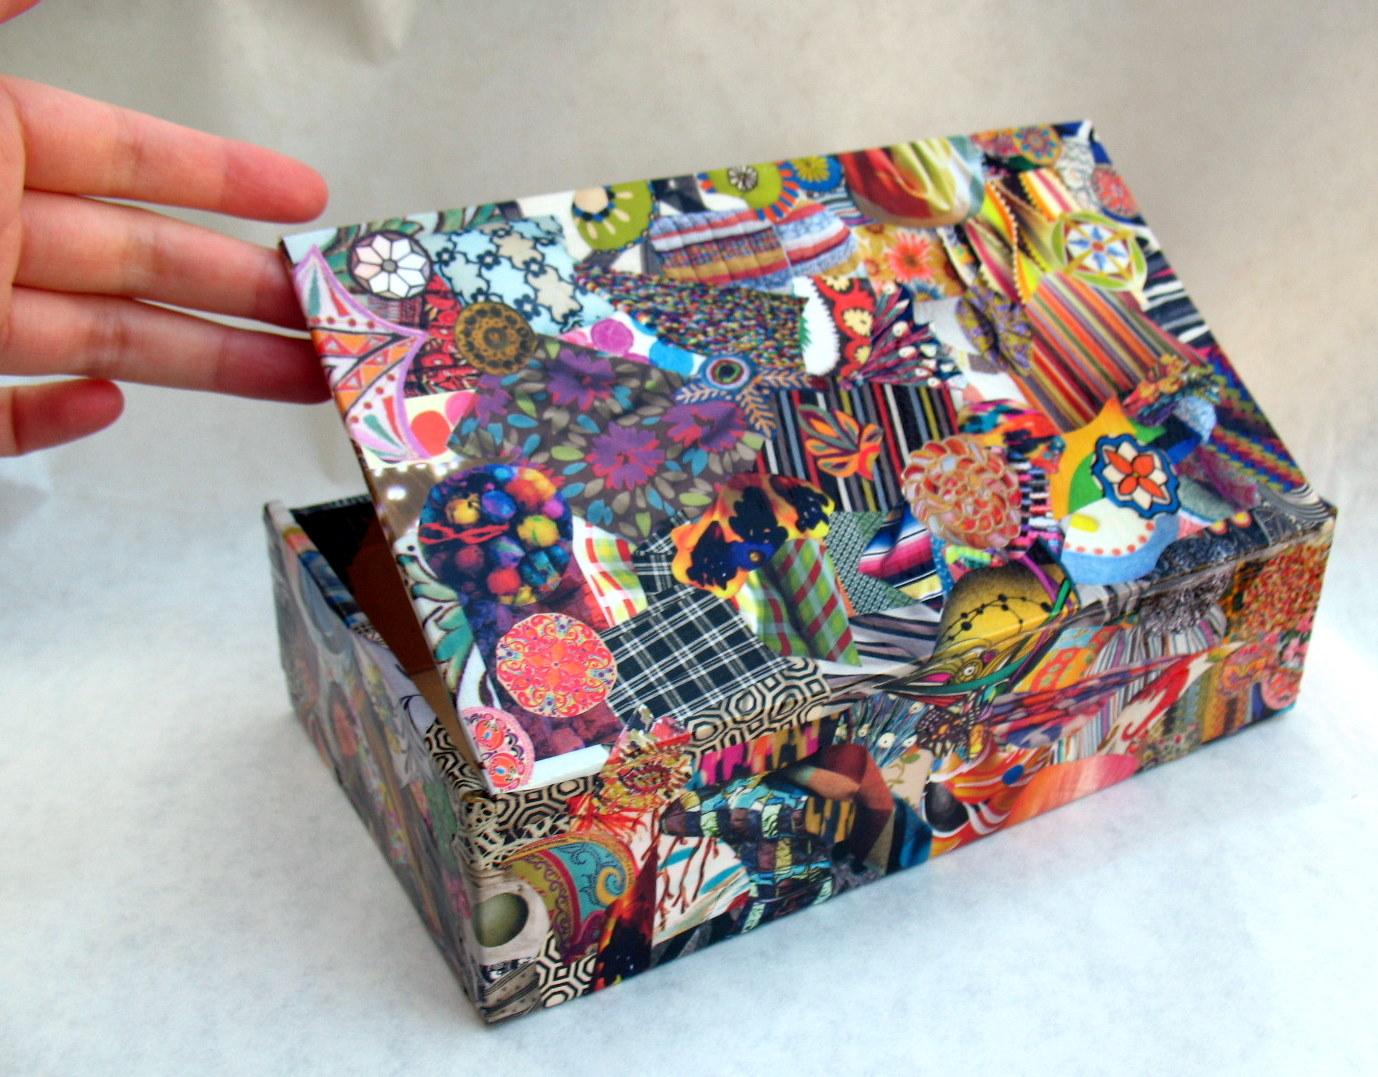 scatola con decoupage